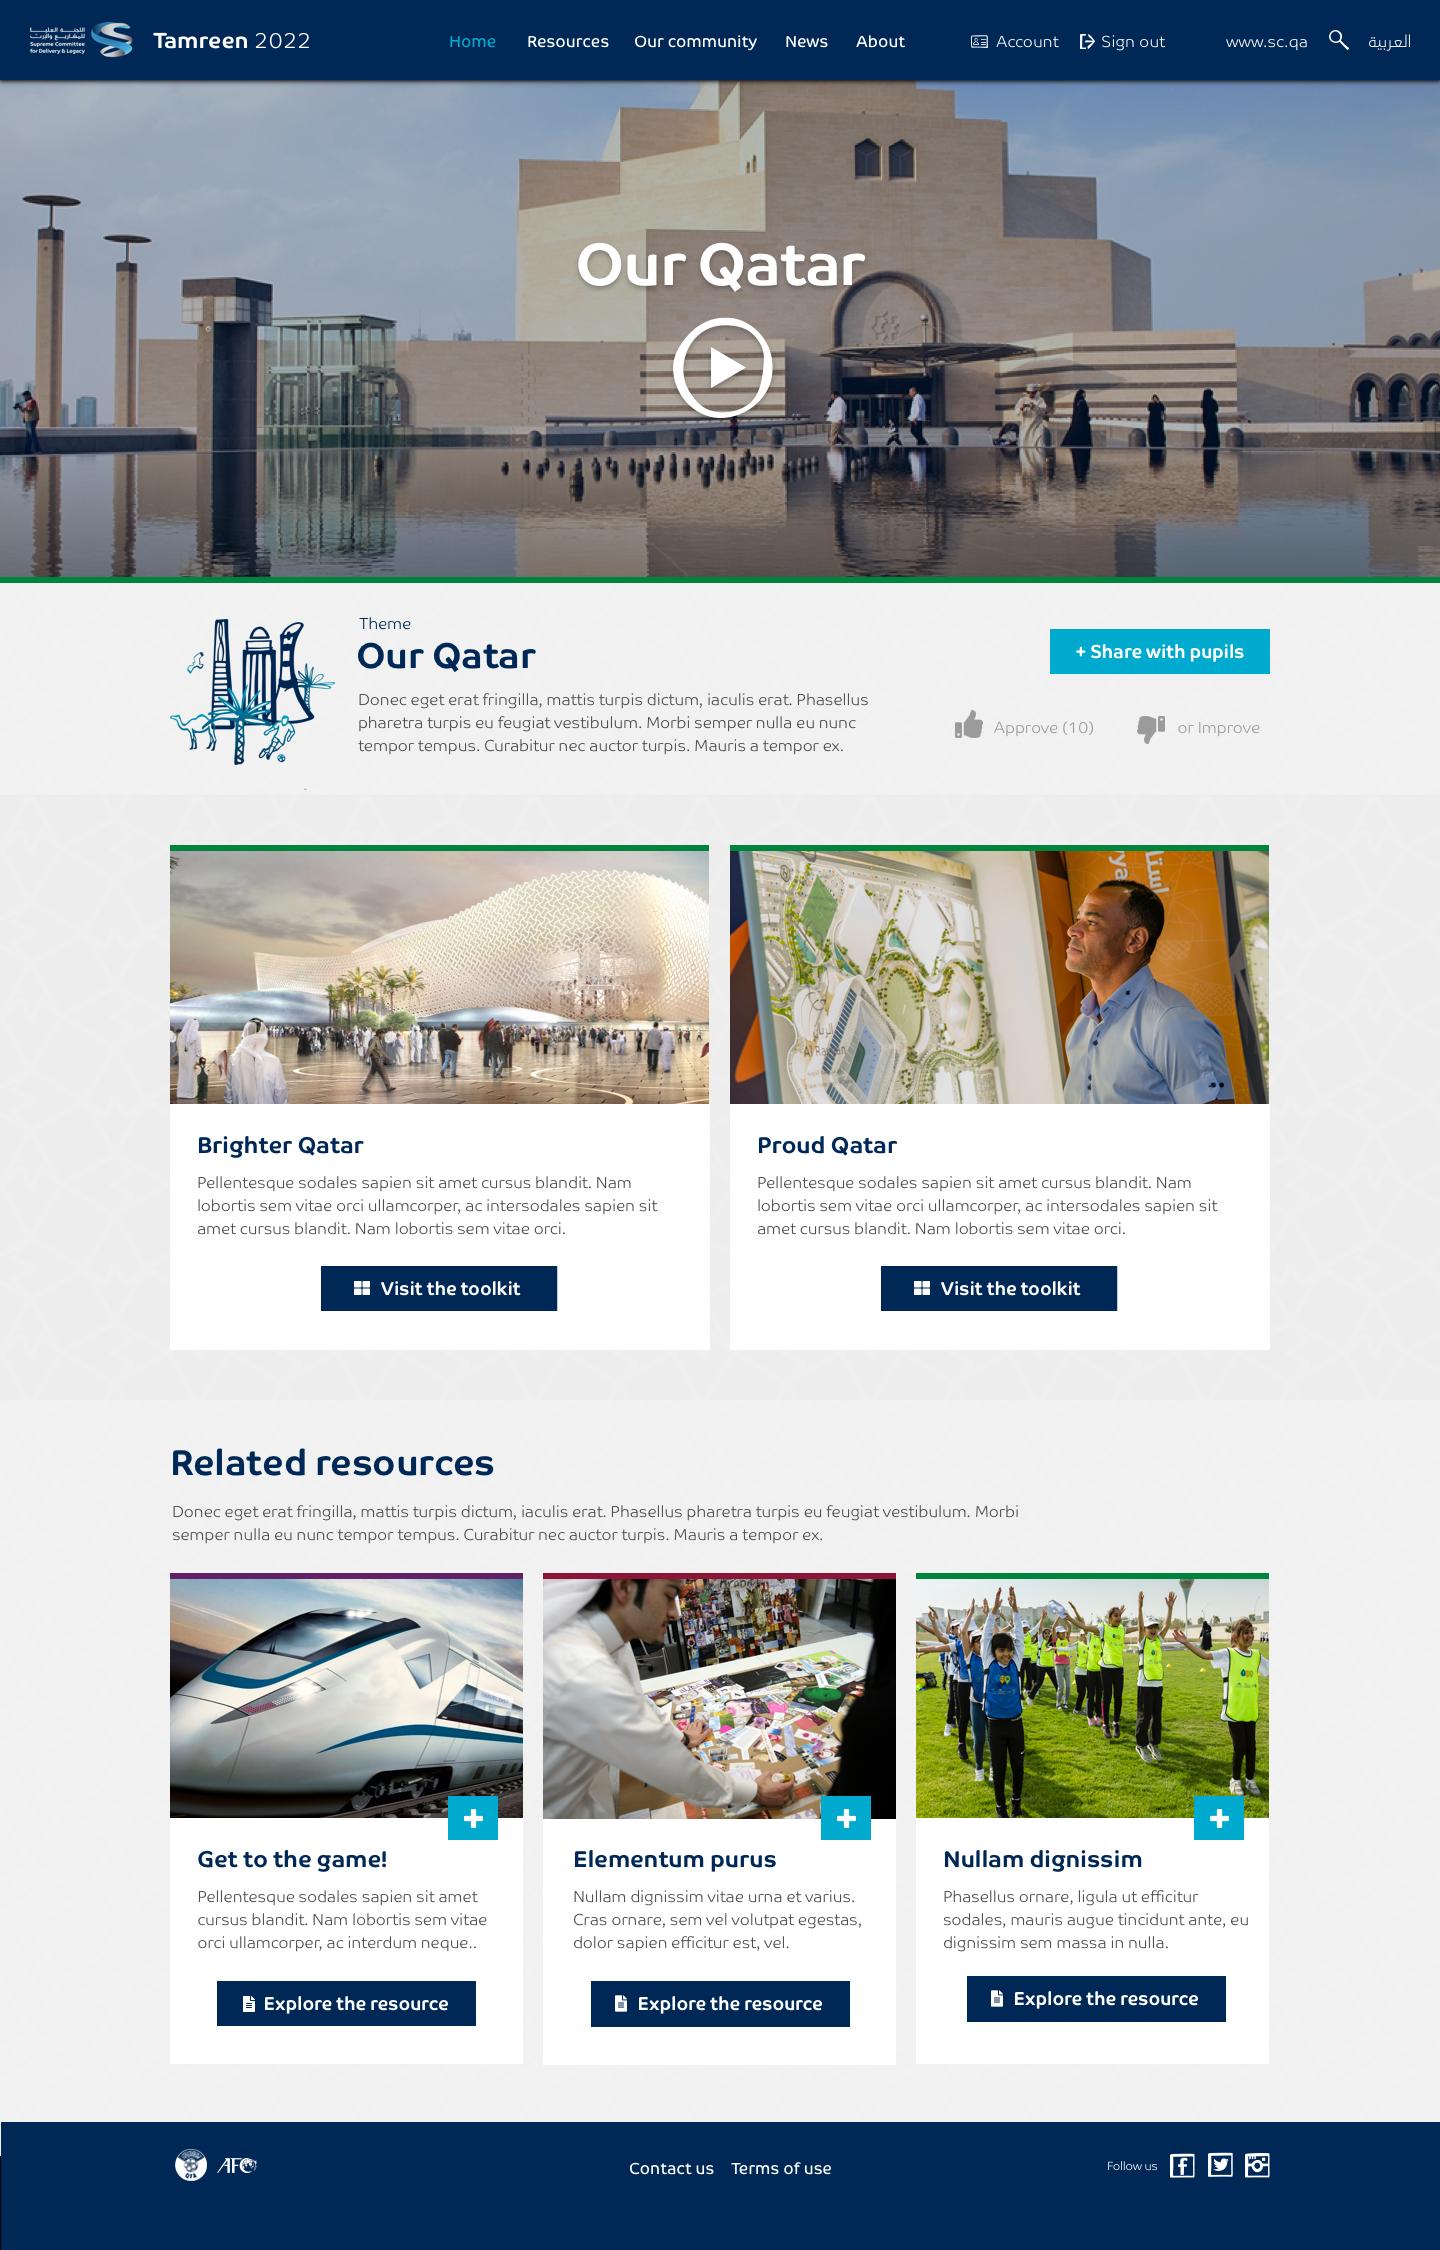 Tamreen 2022 – 2.1 Resources – Themes